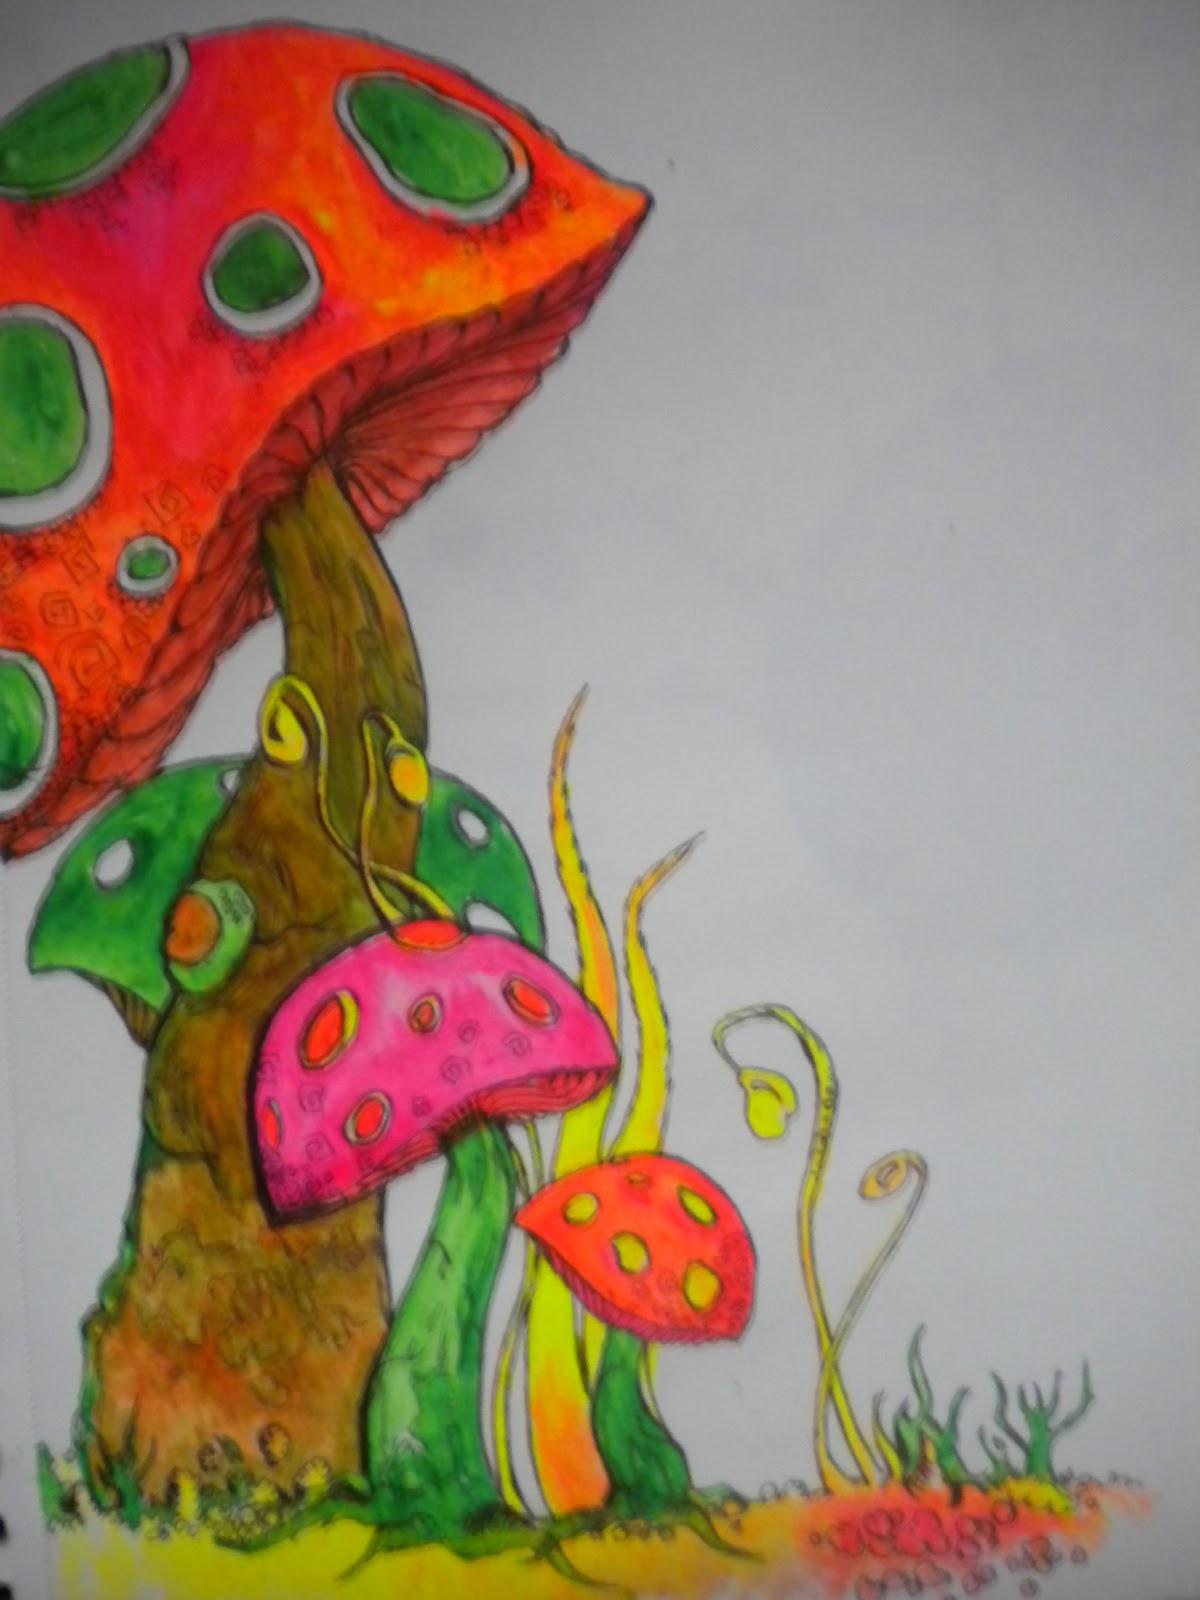 http://3.bp.blogspot.com/-2T-9hug2UNc/TZN3JVW__HI/AAAAAAAAAB8/munjZsGZ-Pk/s1600/DSCN4188.JPG